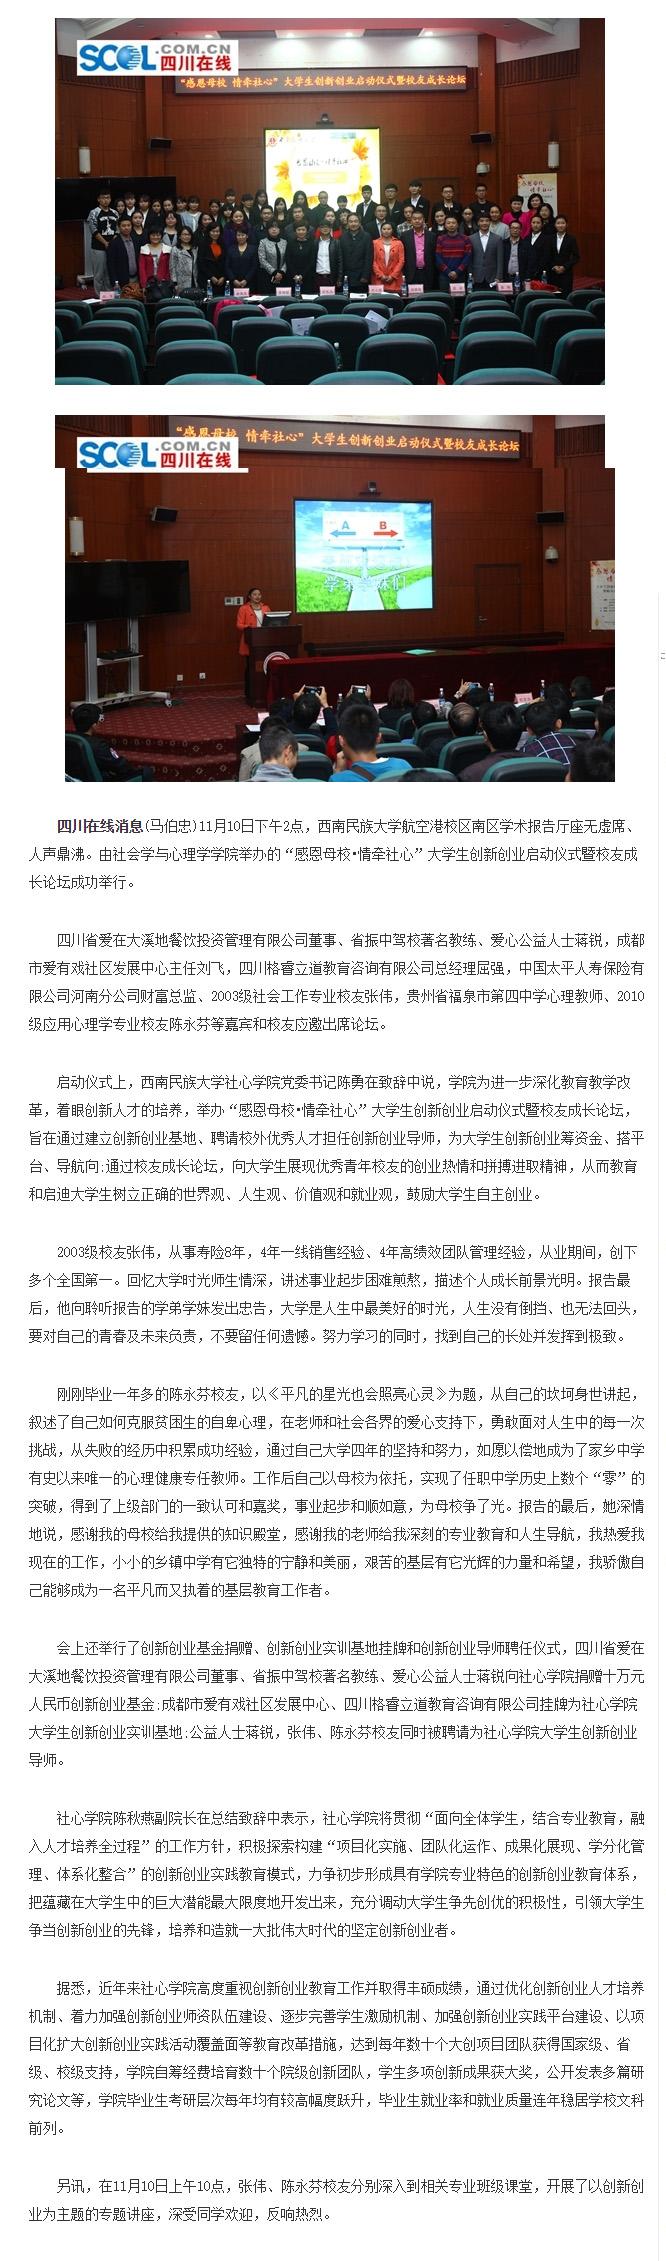 [cml_media_alt id='655']screencapture-news-scol-com-cn-gdxw-201511-54105346-html-1447406153407[/cml_media_alt]